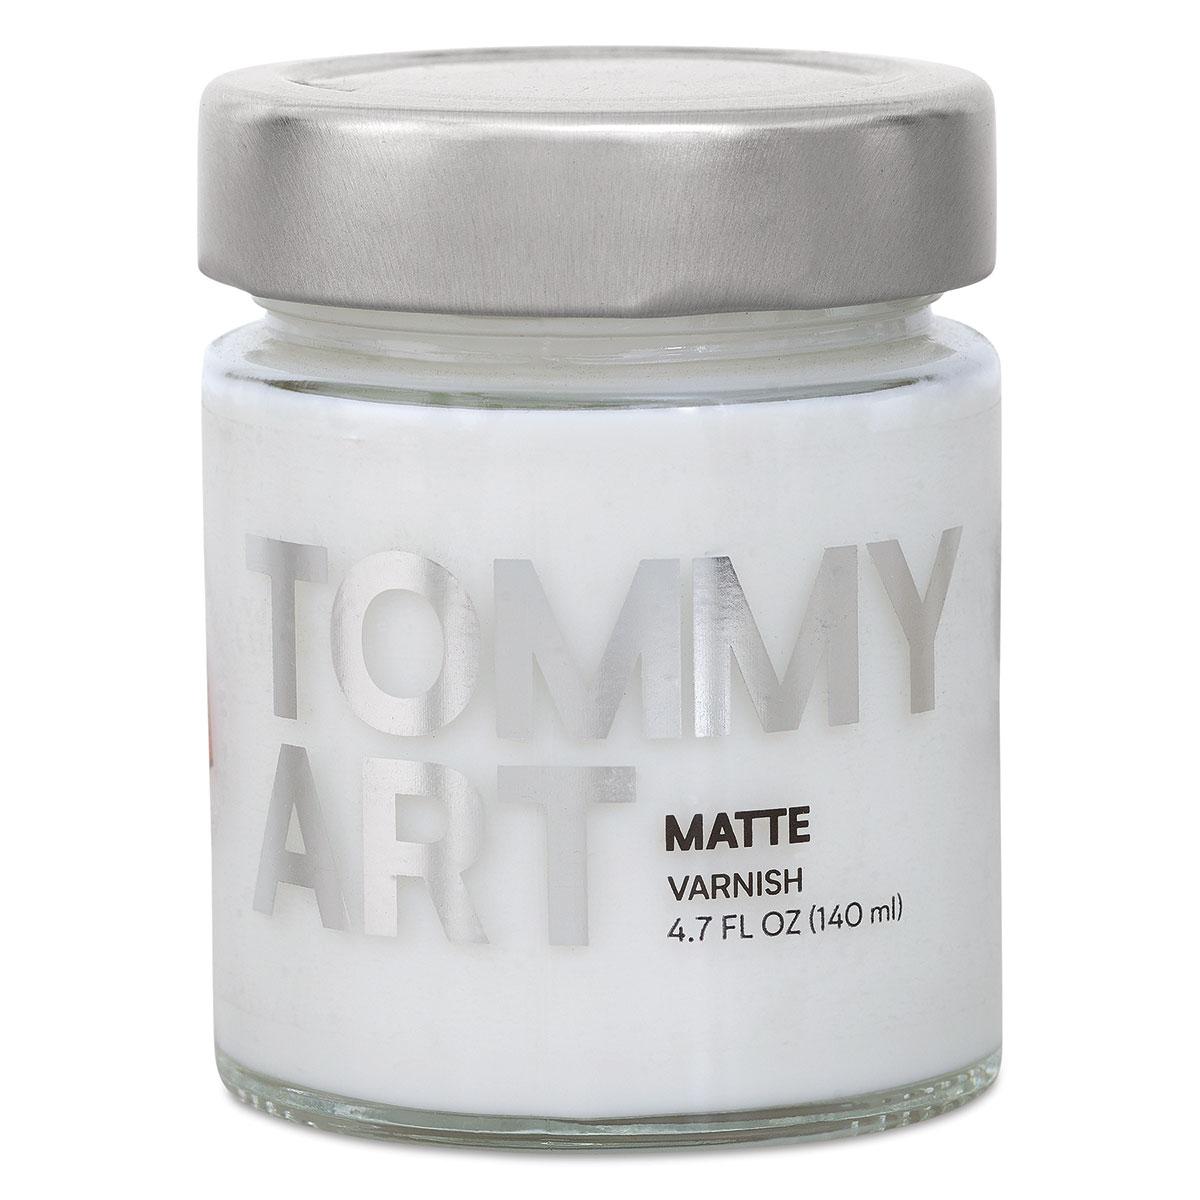 Tommy Art DIY System - Matte Varnish, 140 ml